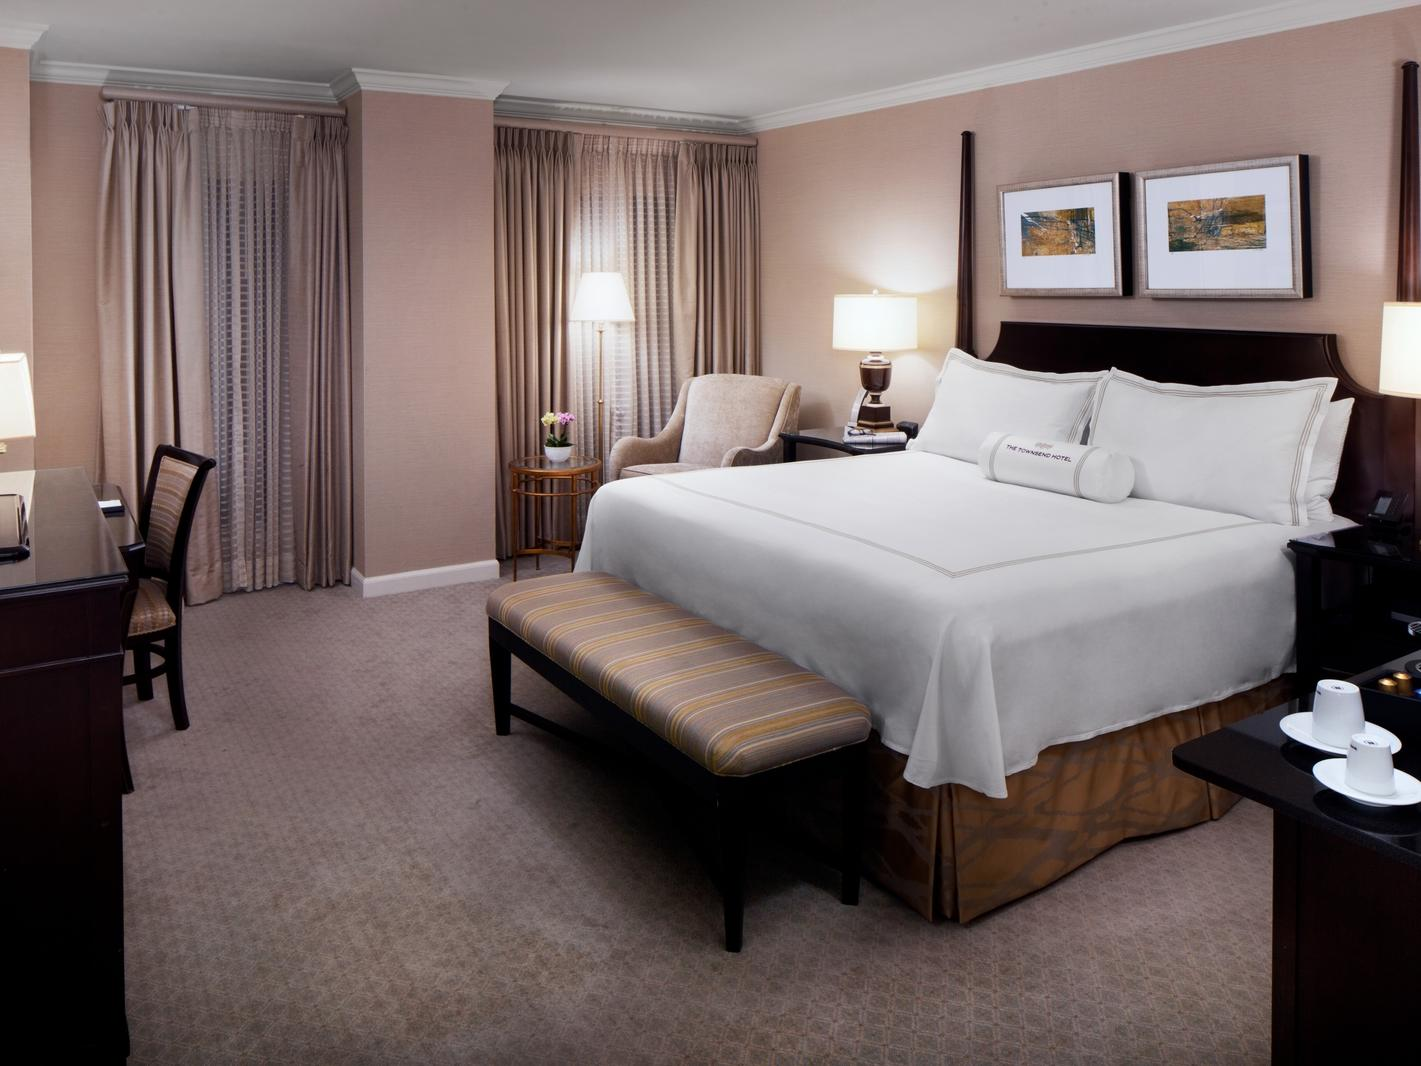 Cozy bed in hotel room